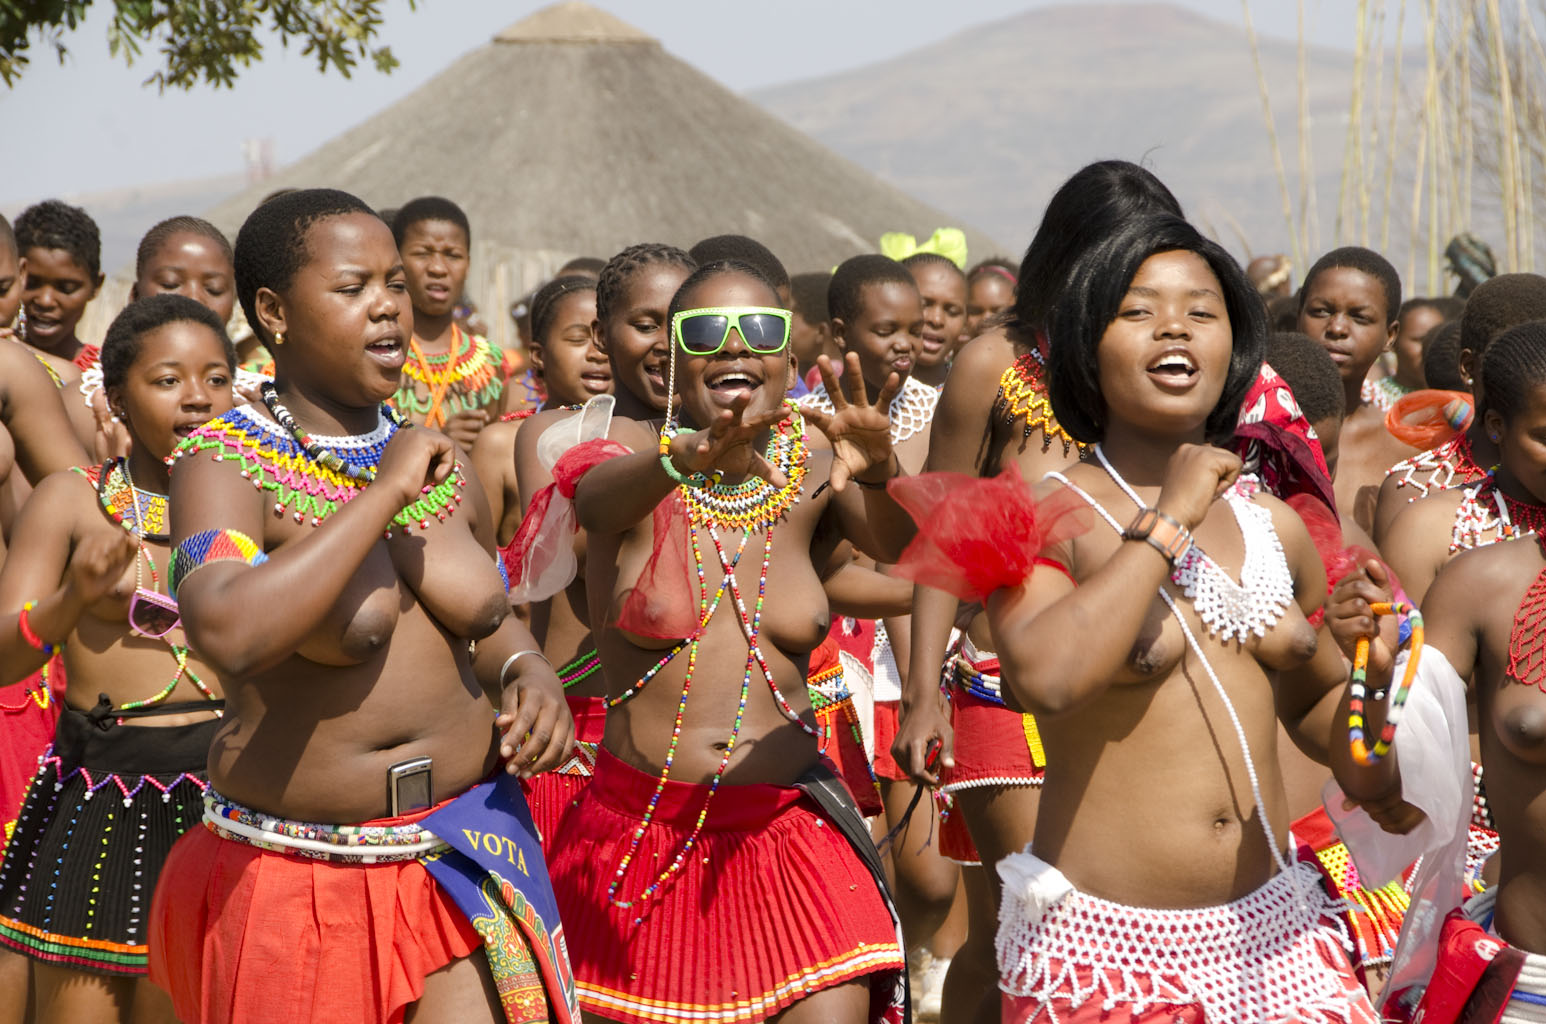 African women dancing nakedtures